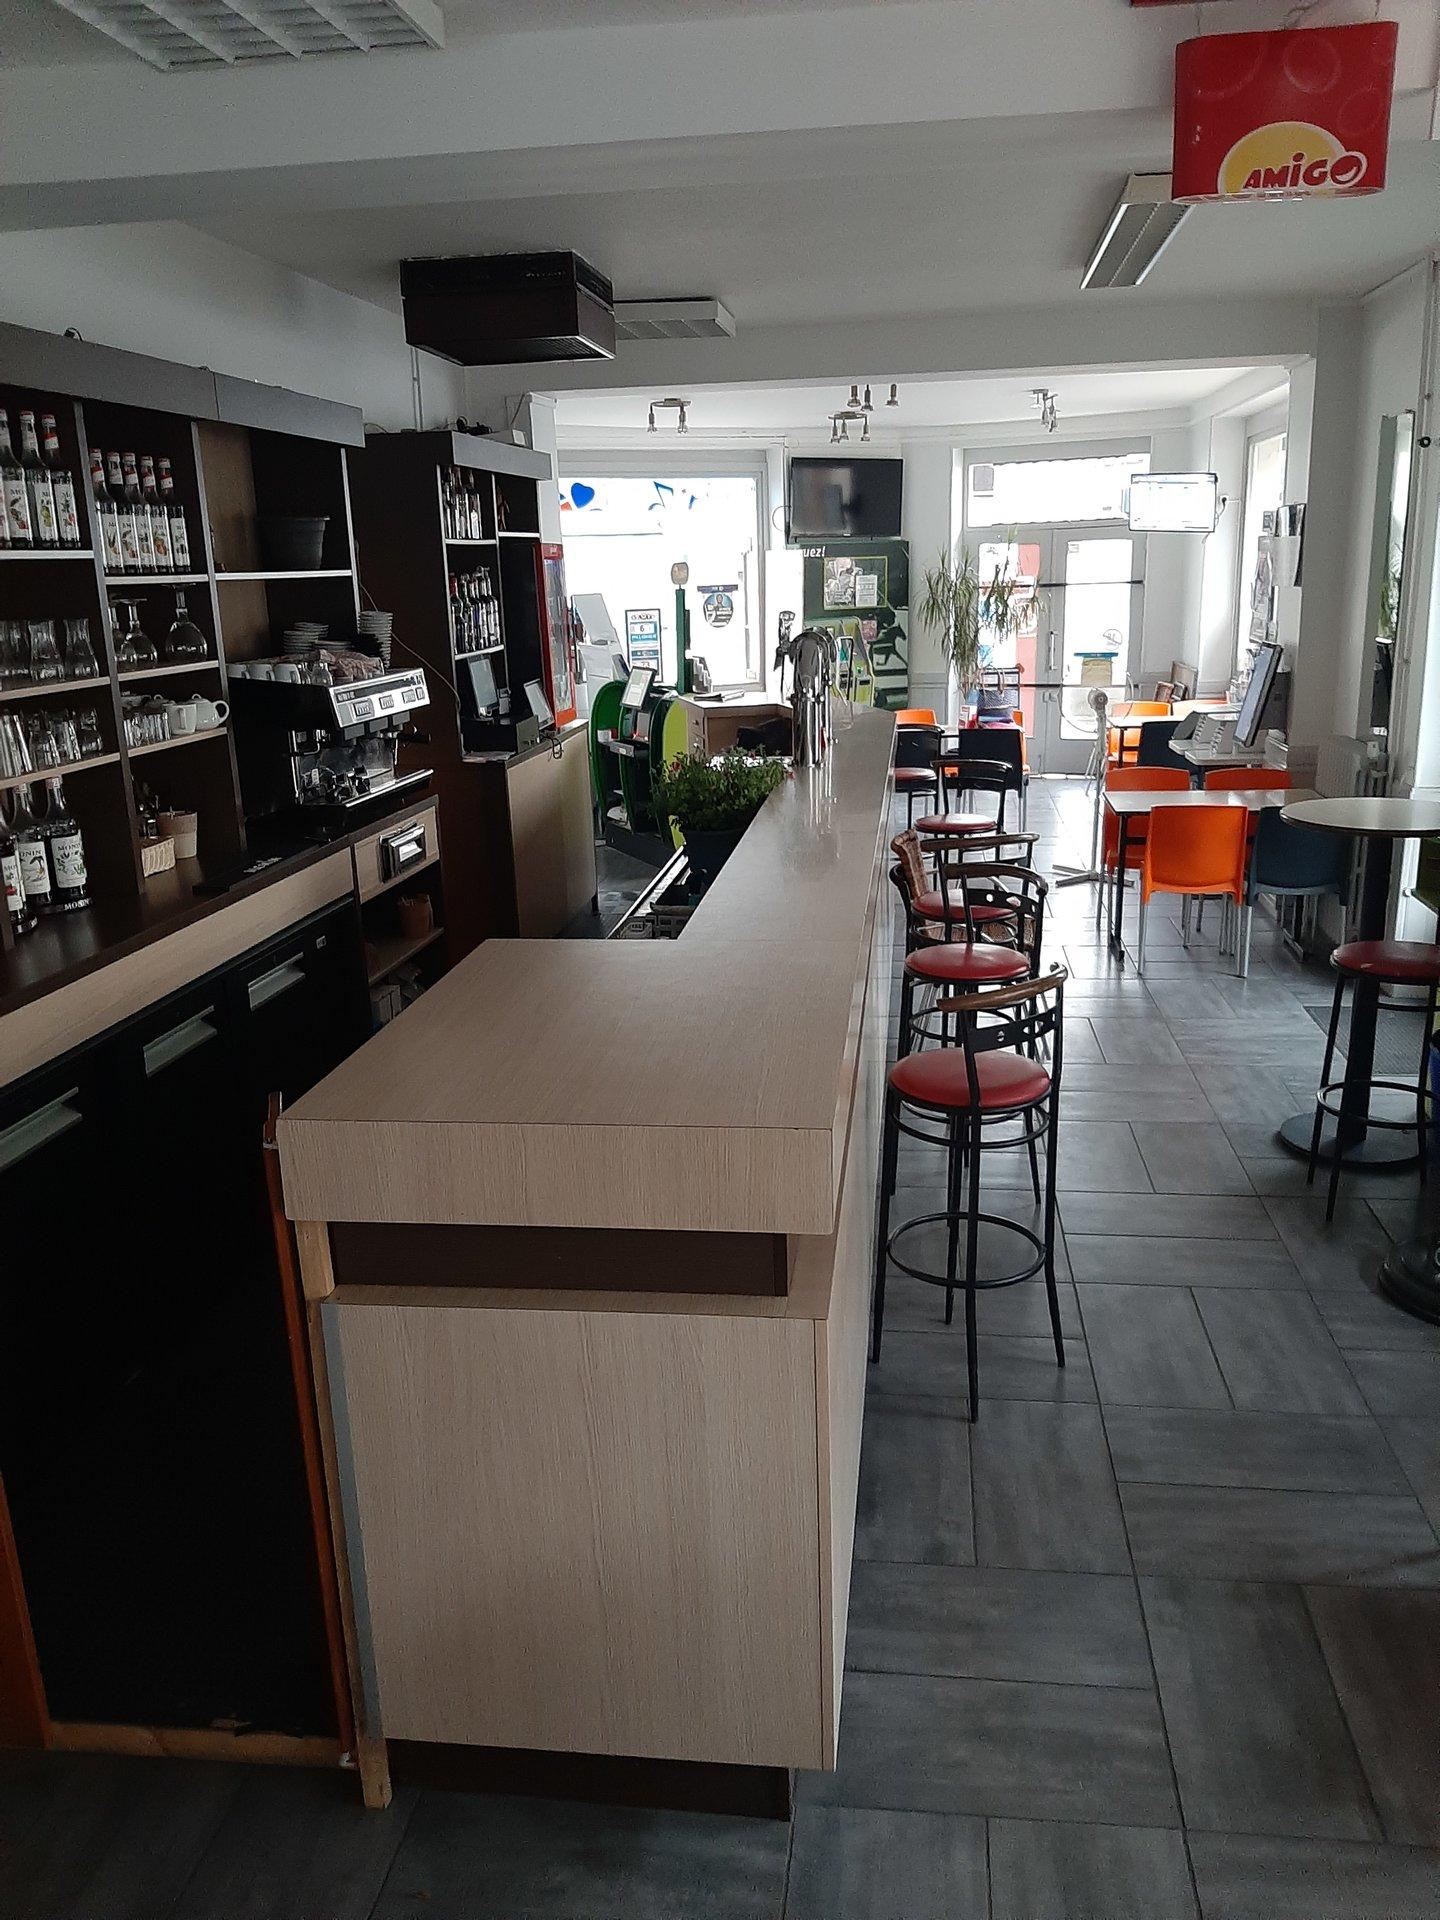 6050SCC- Fds Commerce Bar, PMU, Loto, Snack,